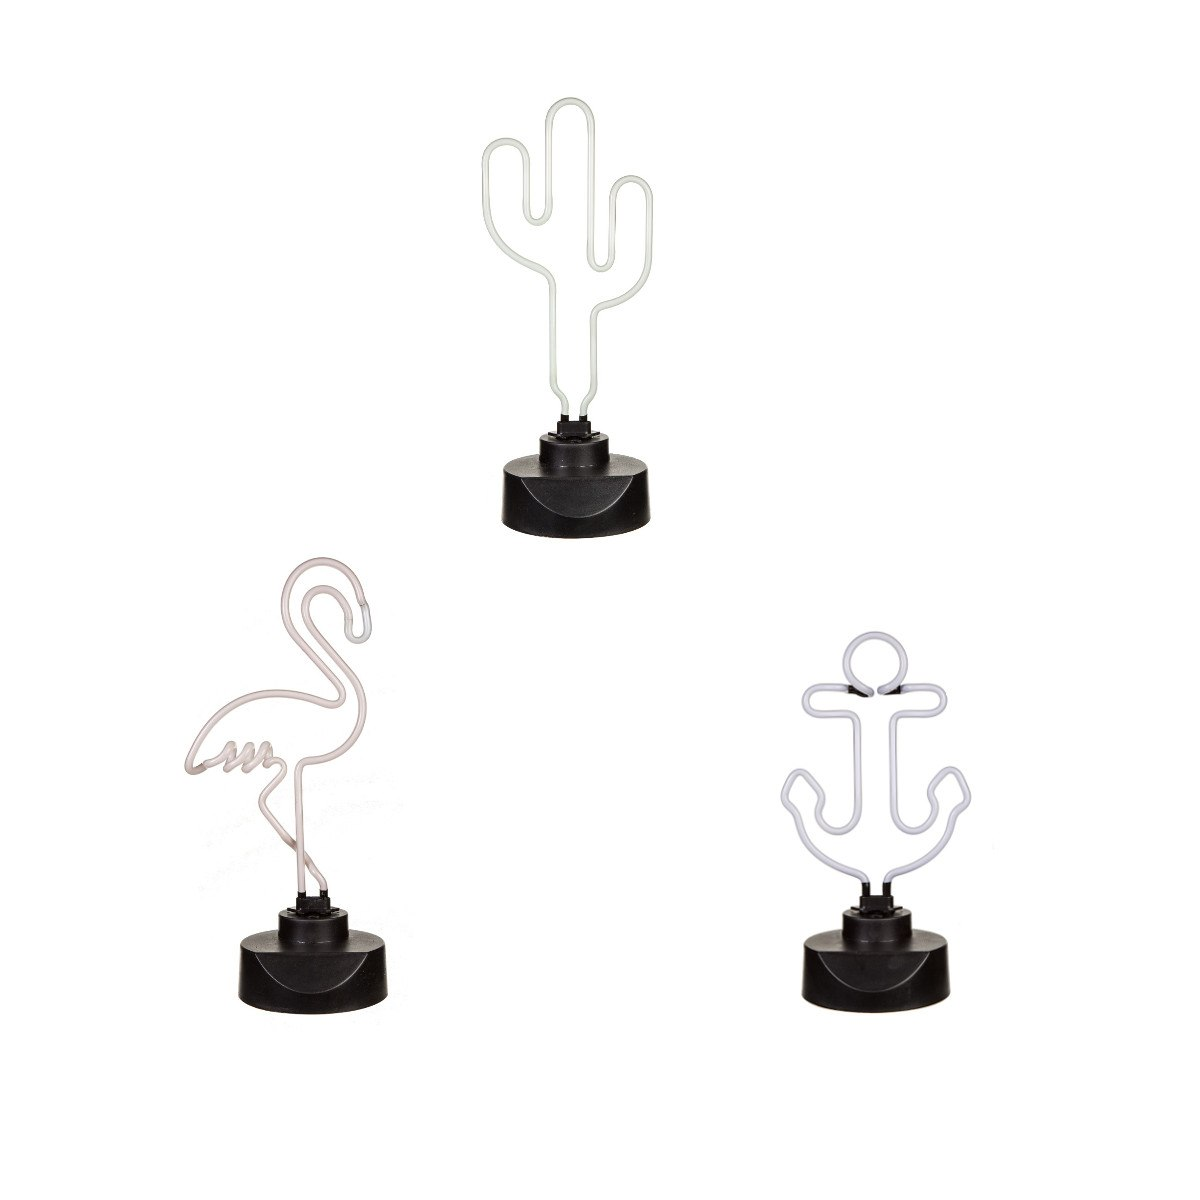 Neonlampor i olika former